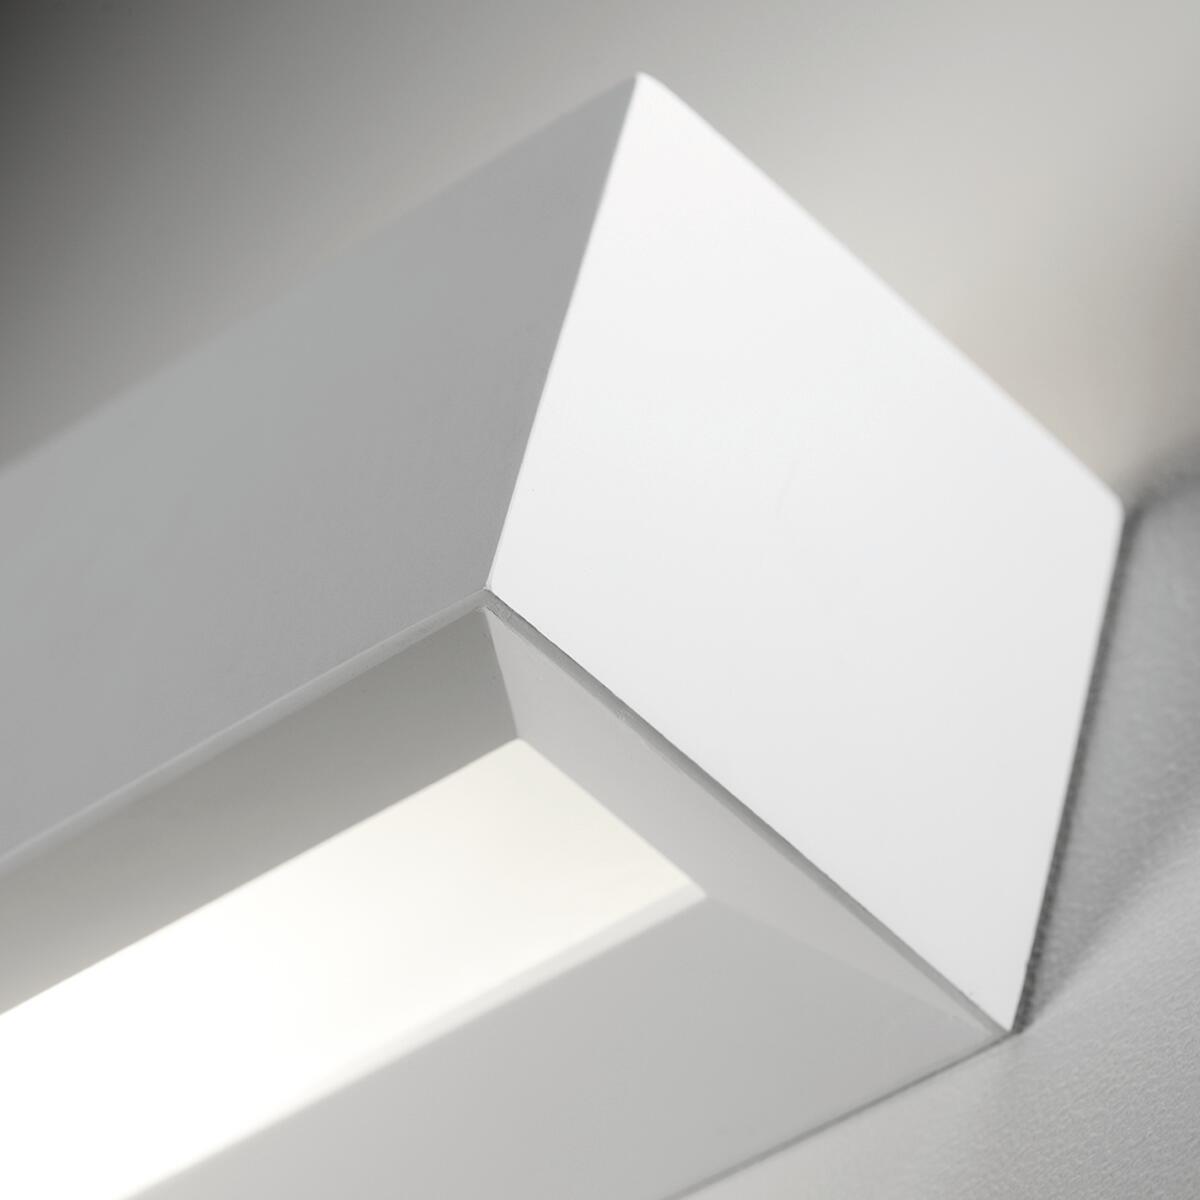 Applique design Hermione bianco, in gesso, 7x35 cm, 2 luci TECNICO - 3